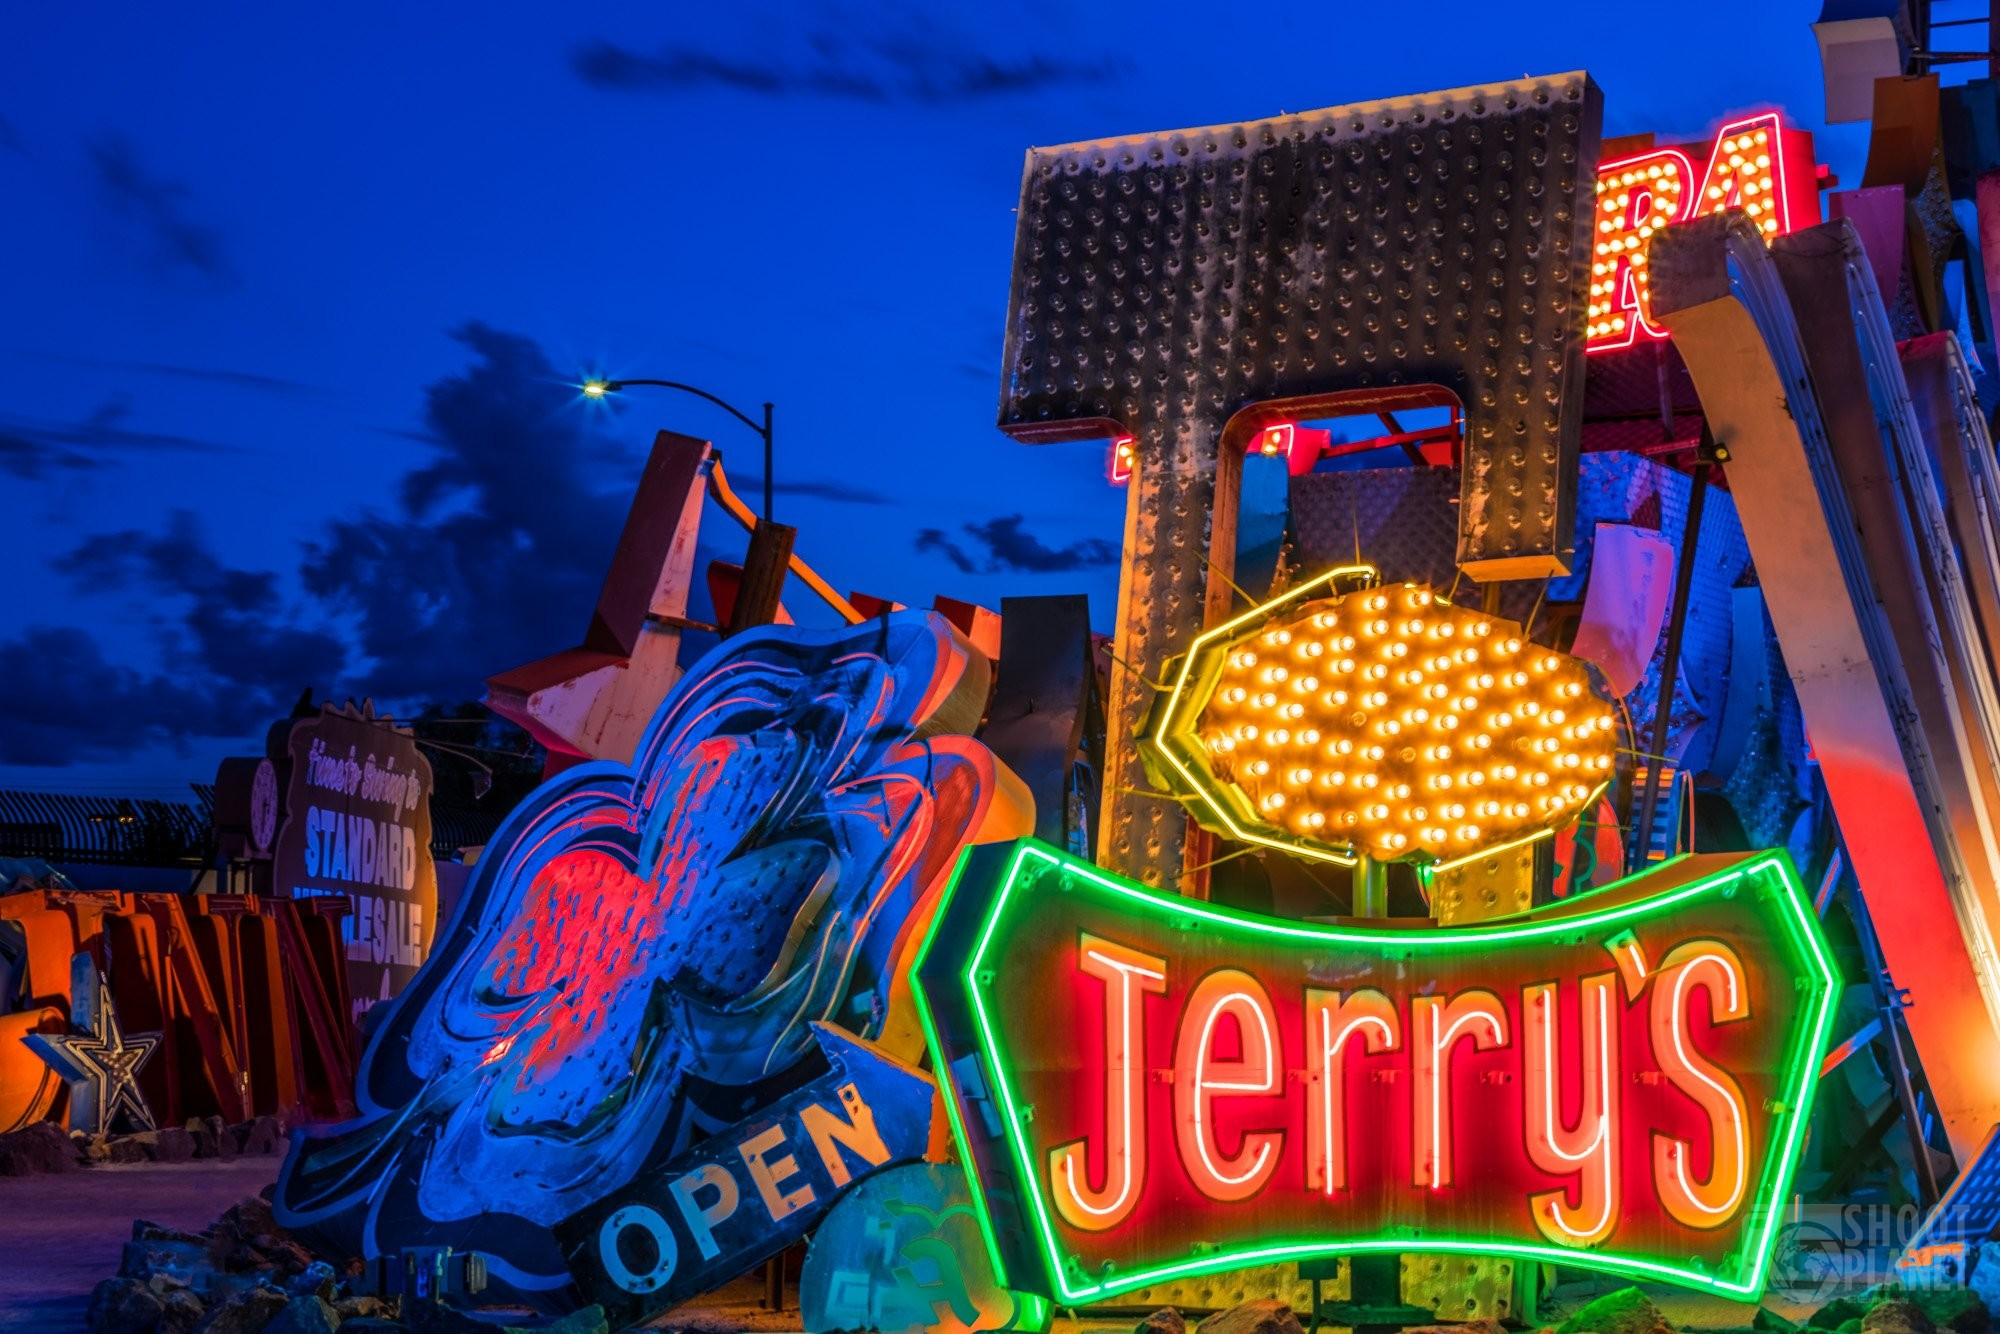 Vintage casino neon signs dusk, Las Vegas